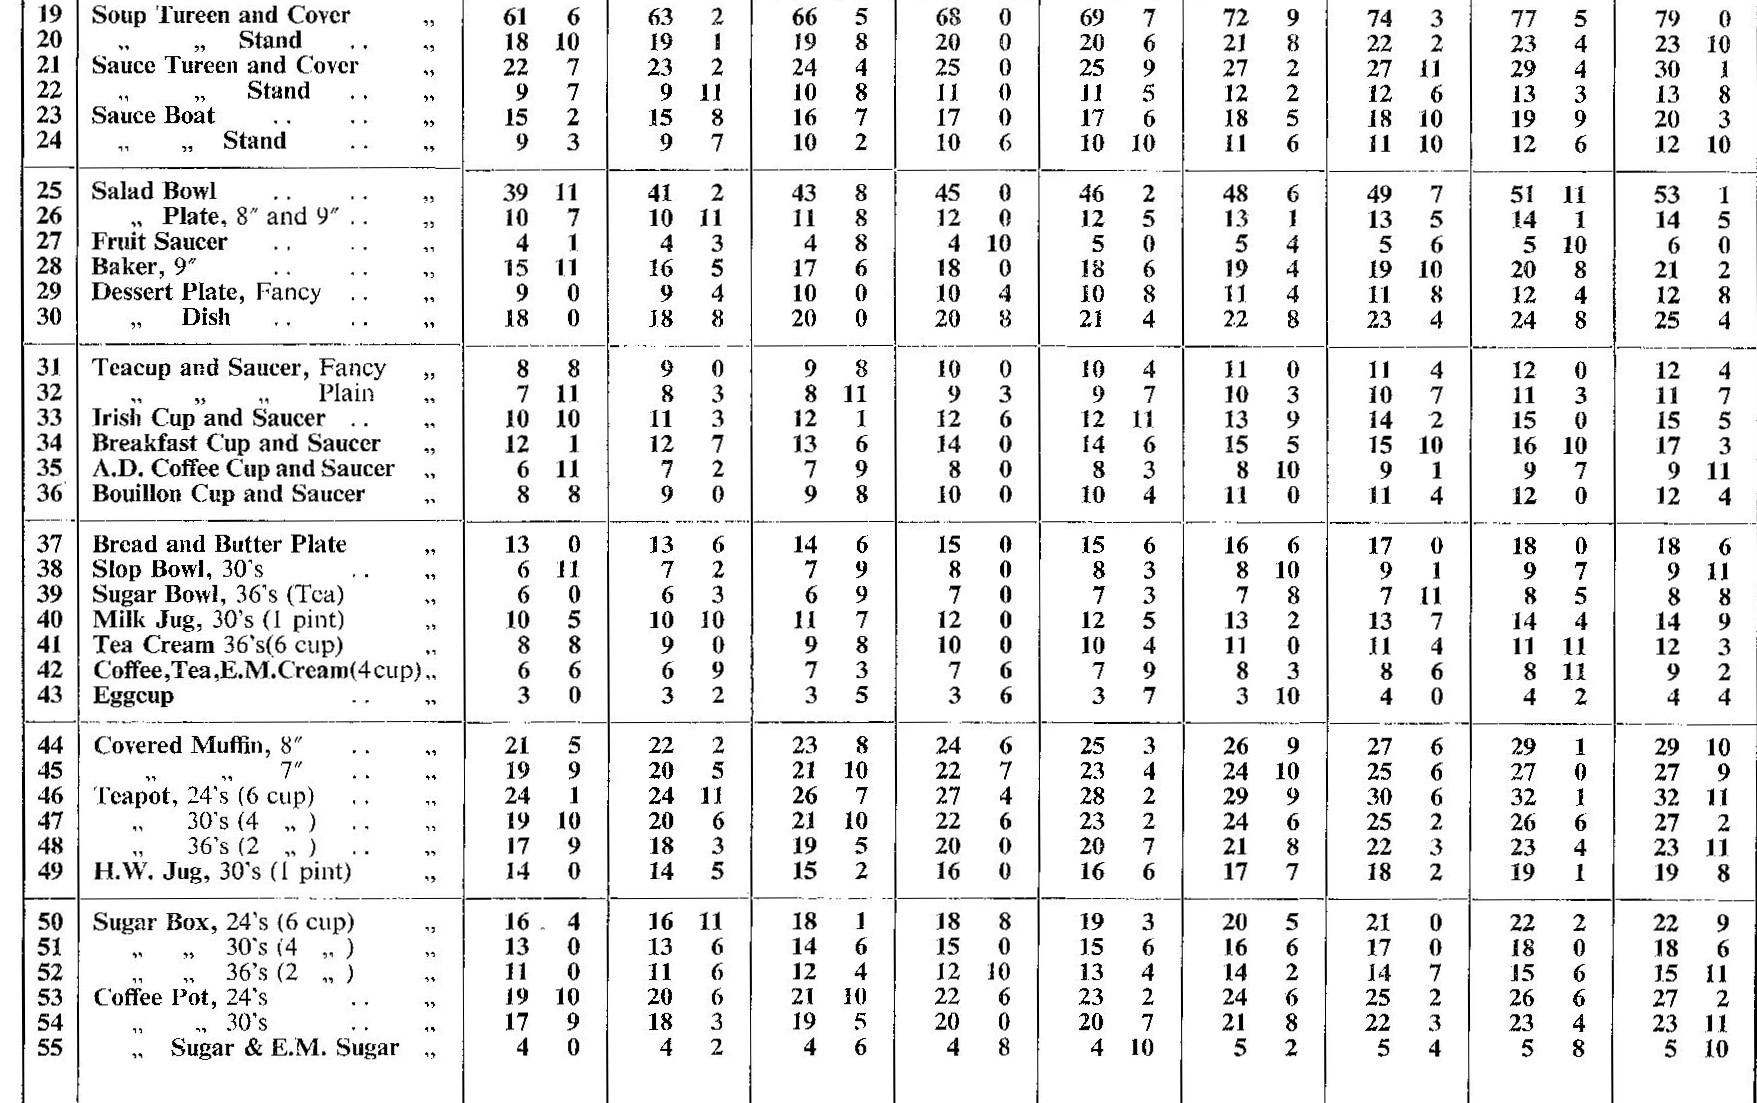 royal-crown-derby-price-list-1952